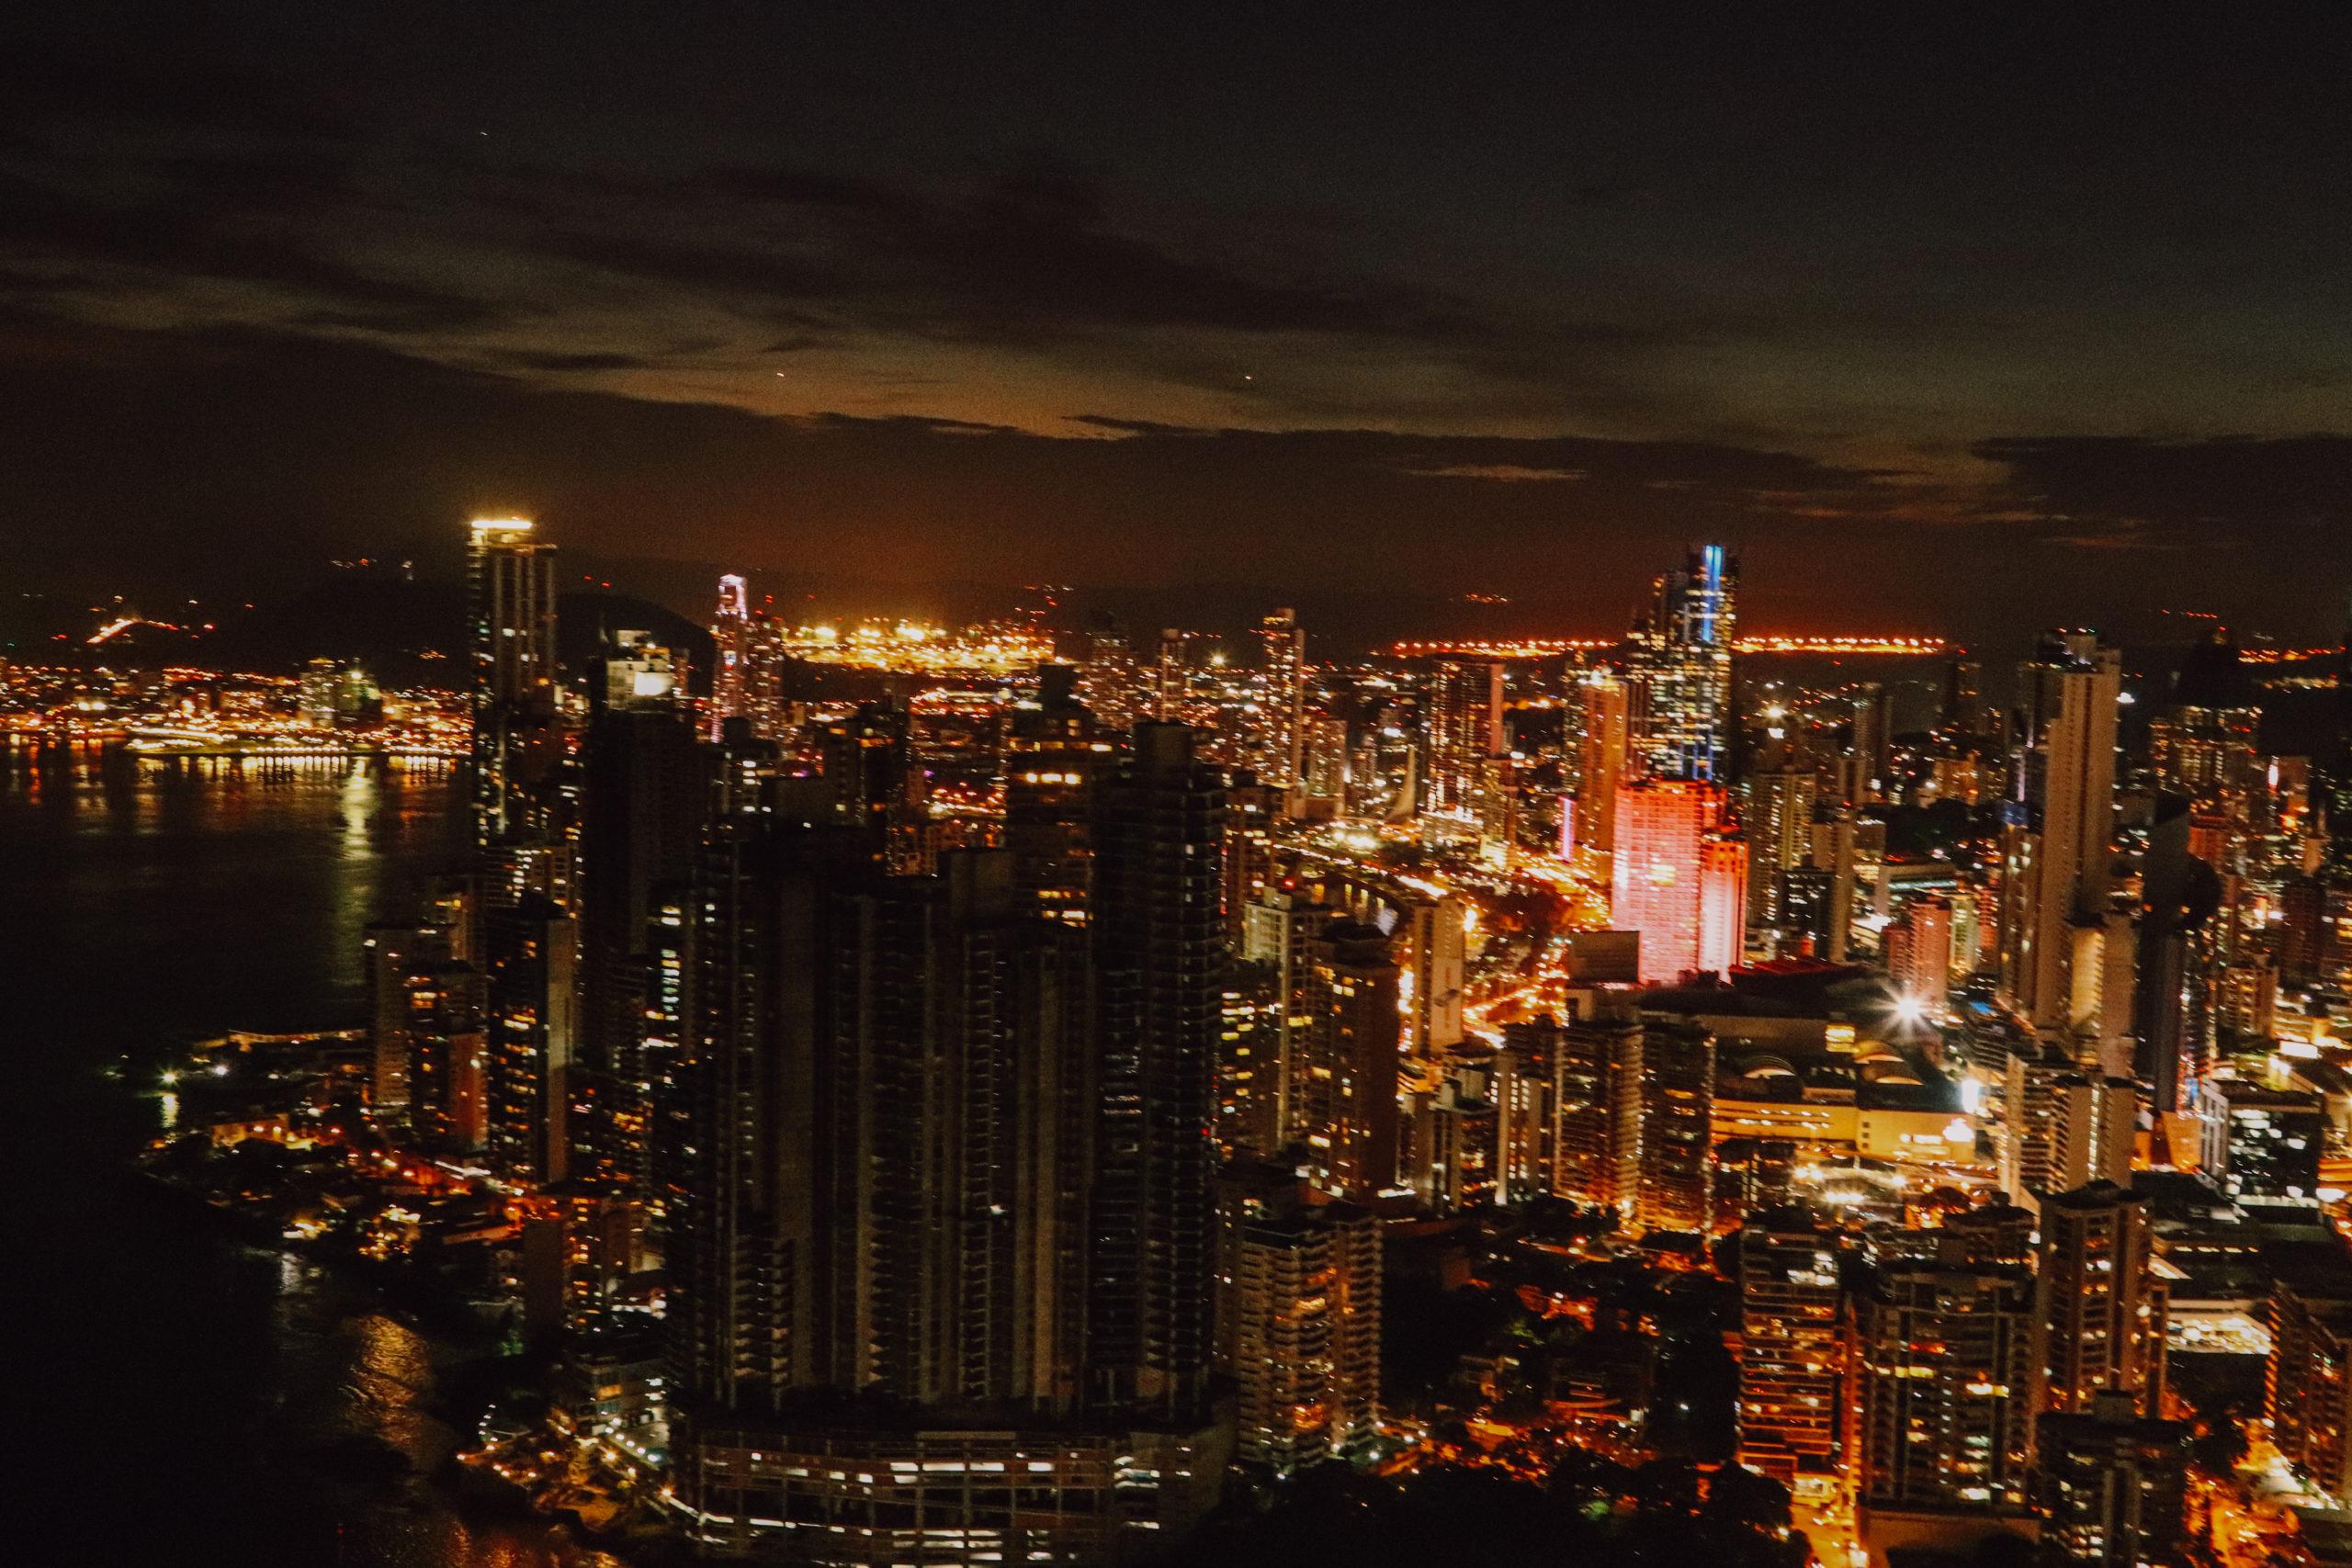 Sonnenuntergang über Panama City